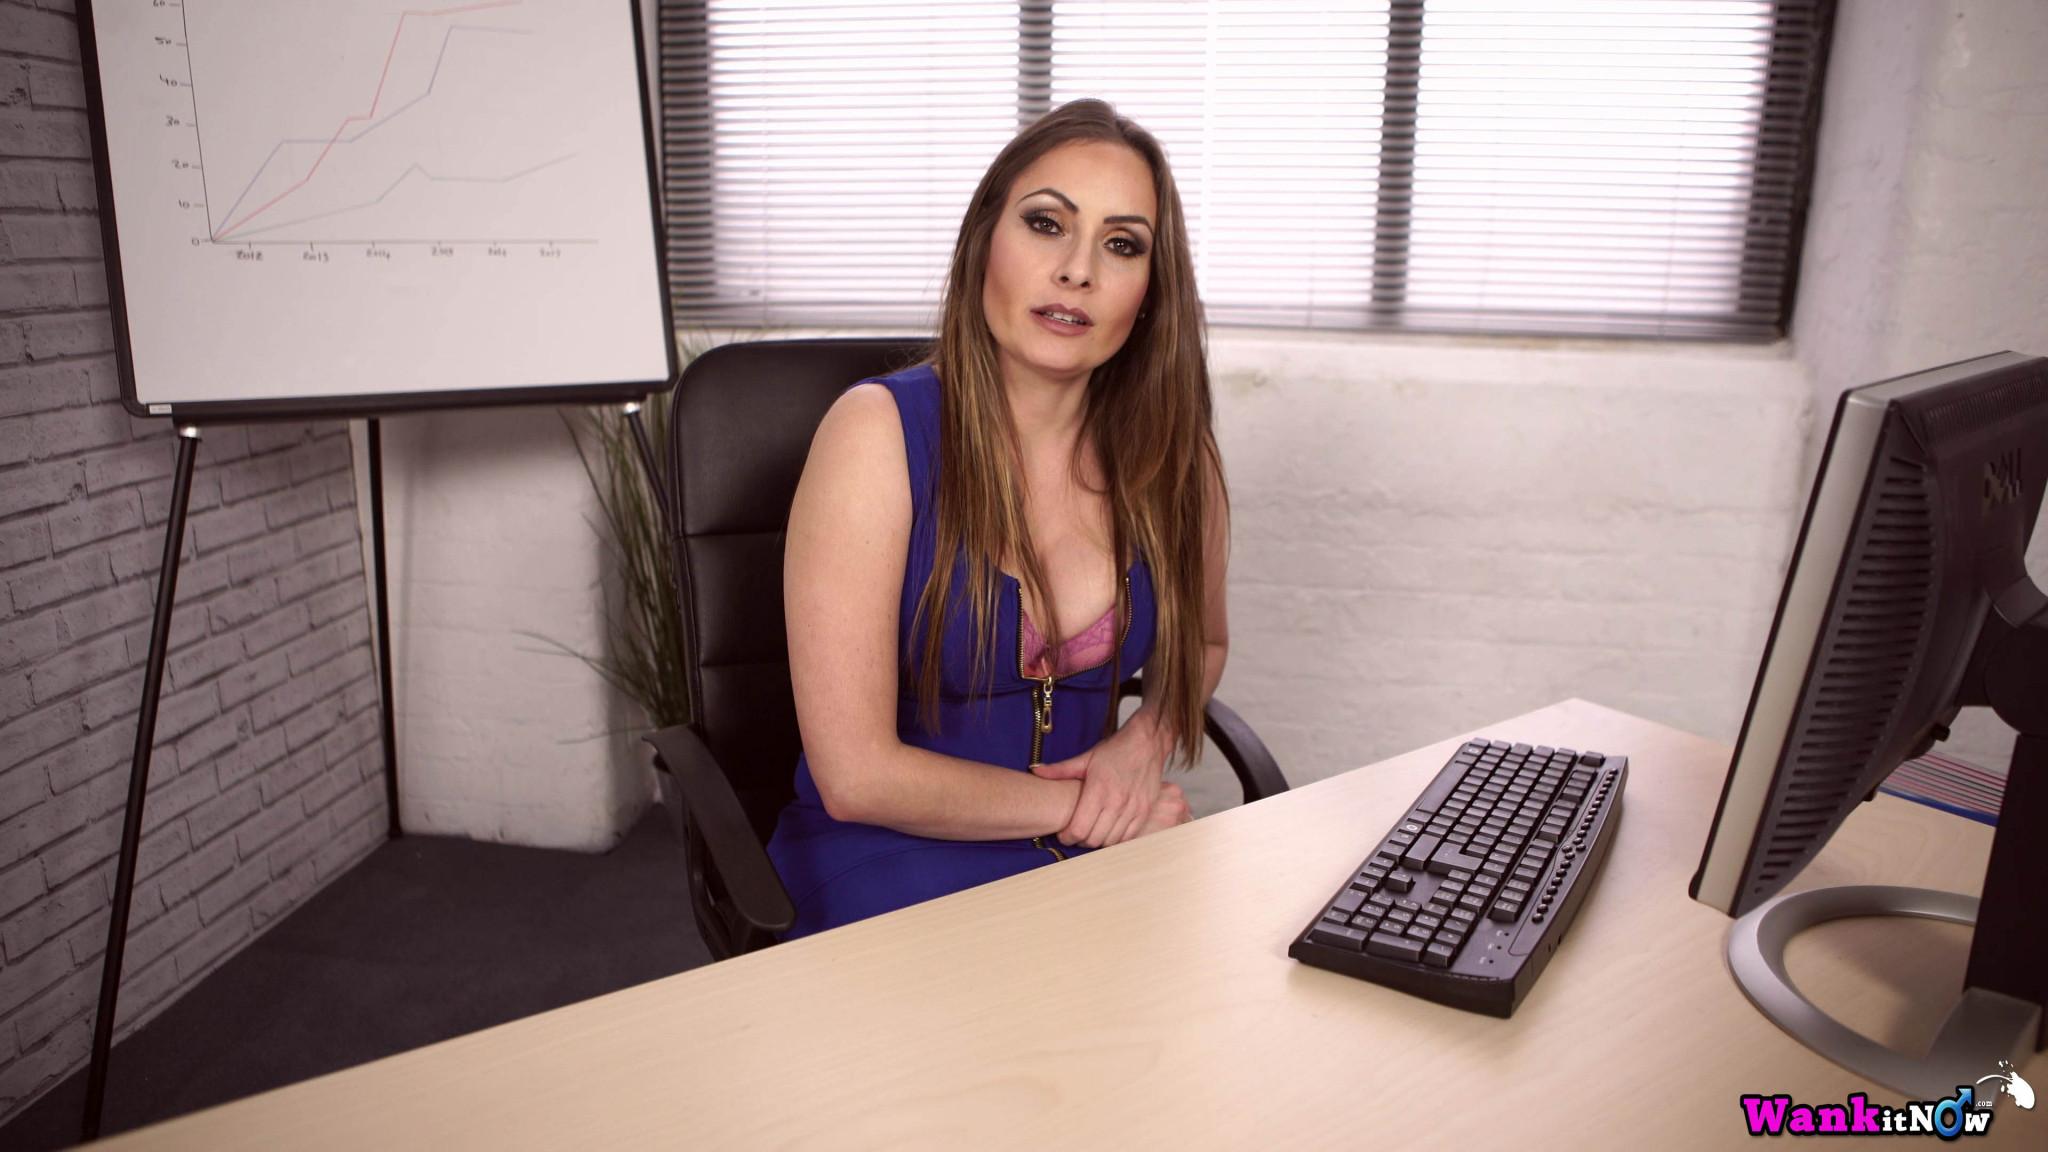 Sophia Delane - В офисе - Галерея № 3505199